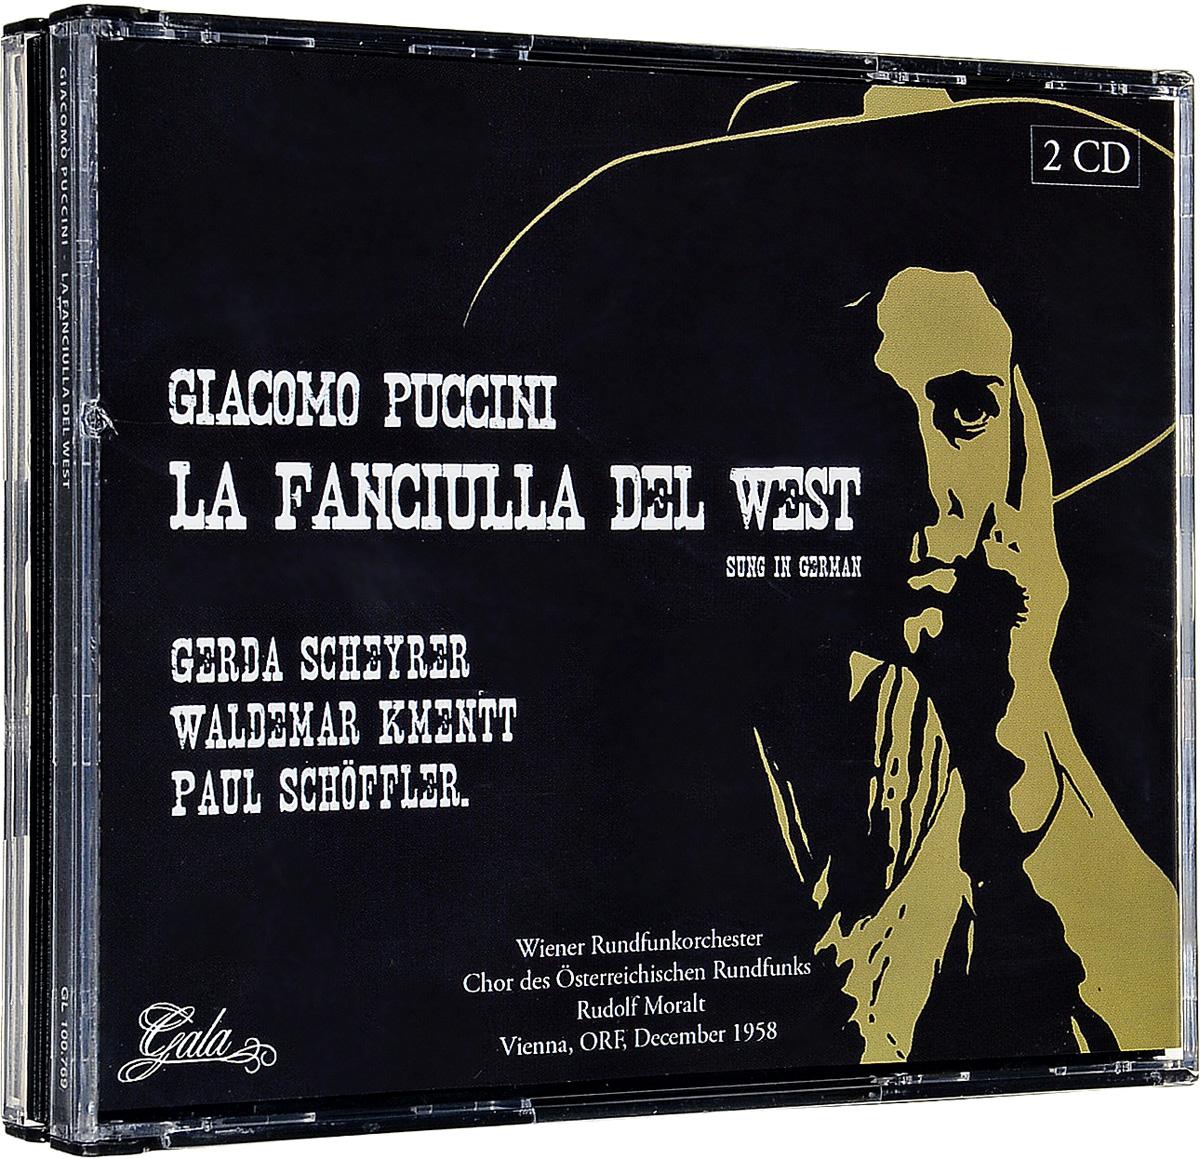 Джакомо Пуччини Giacomo Puccini. La Fanciulla Del West (Vienna, Orf, December 1958) (2 CD) джакомо пуччини toska